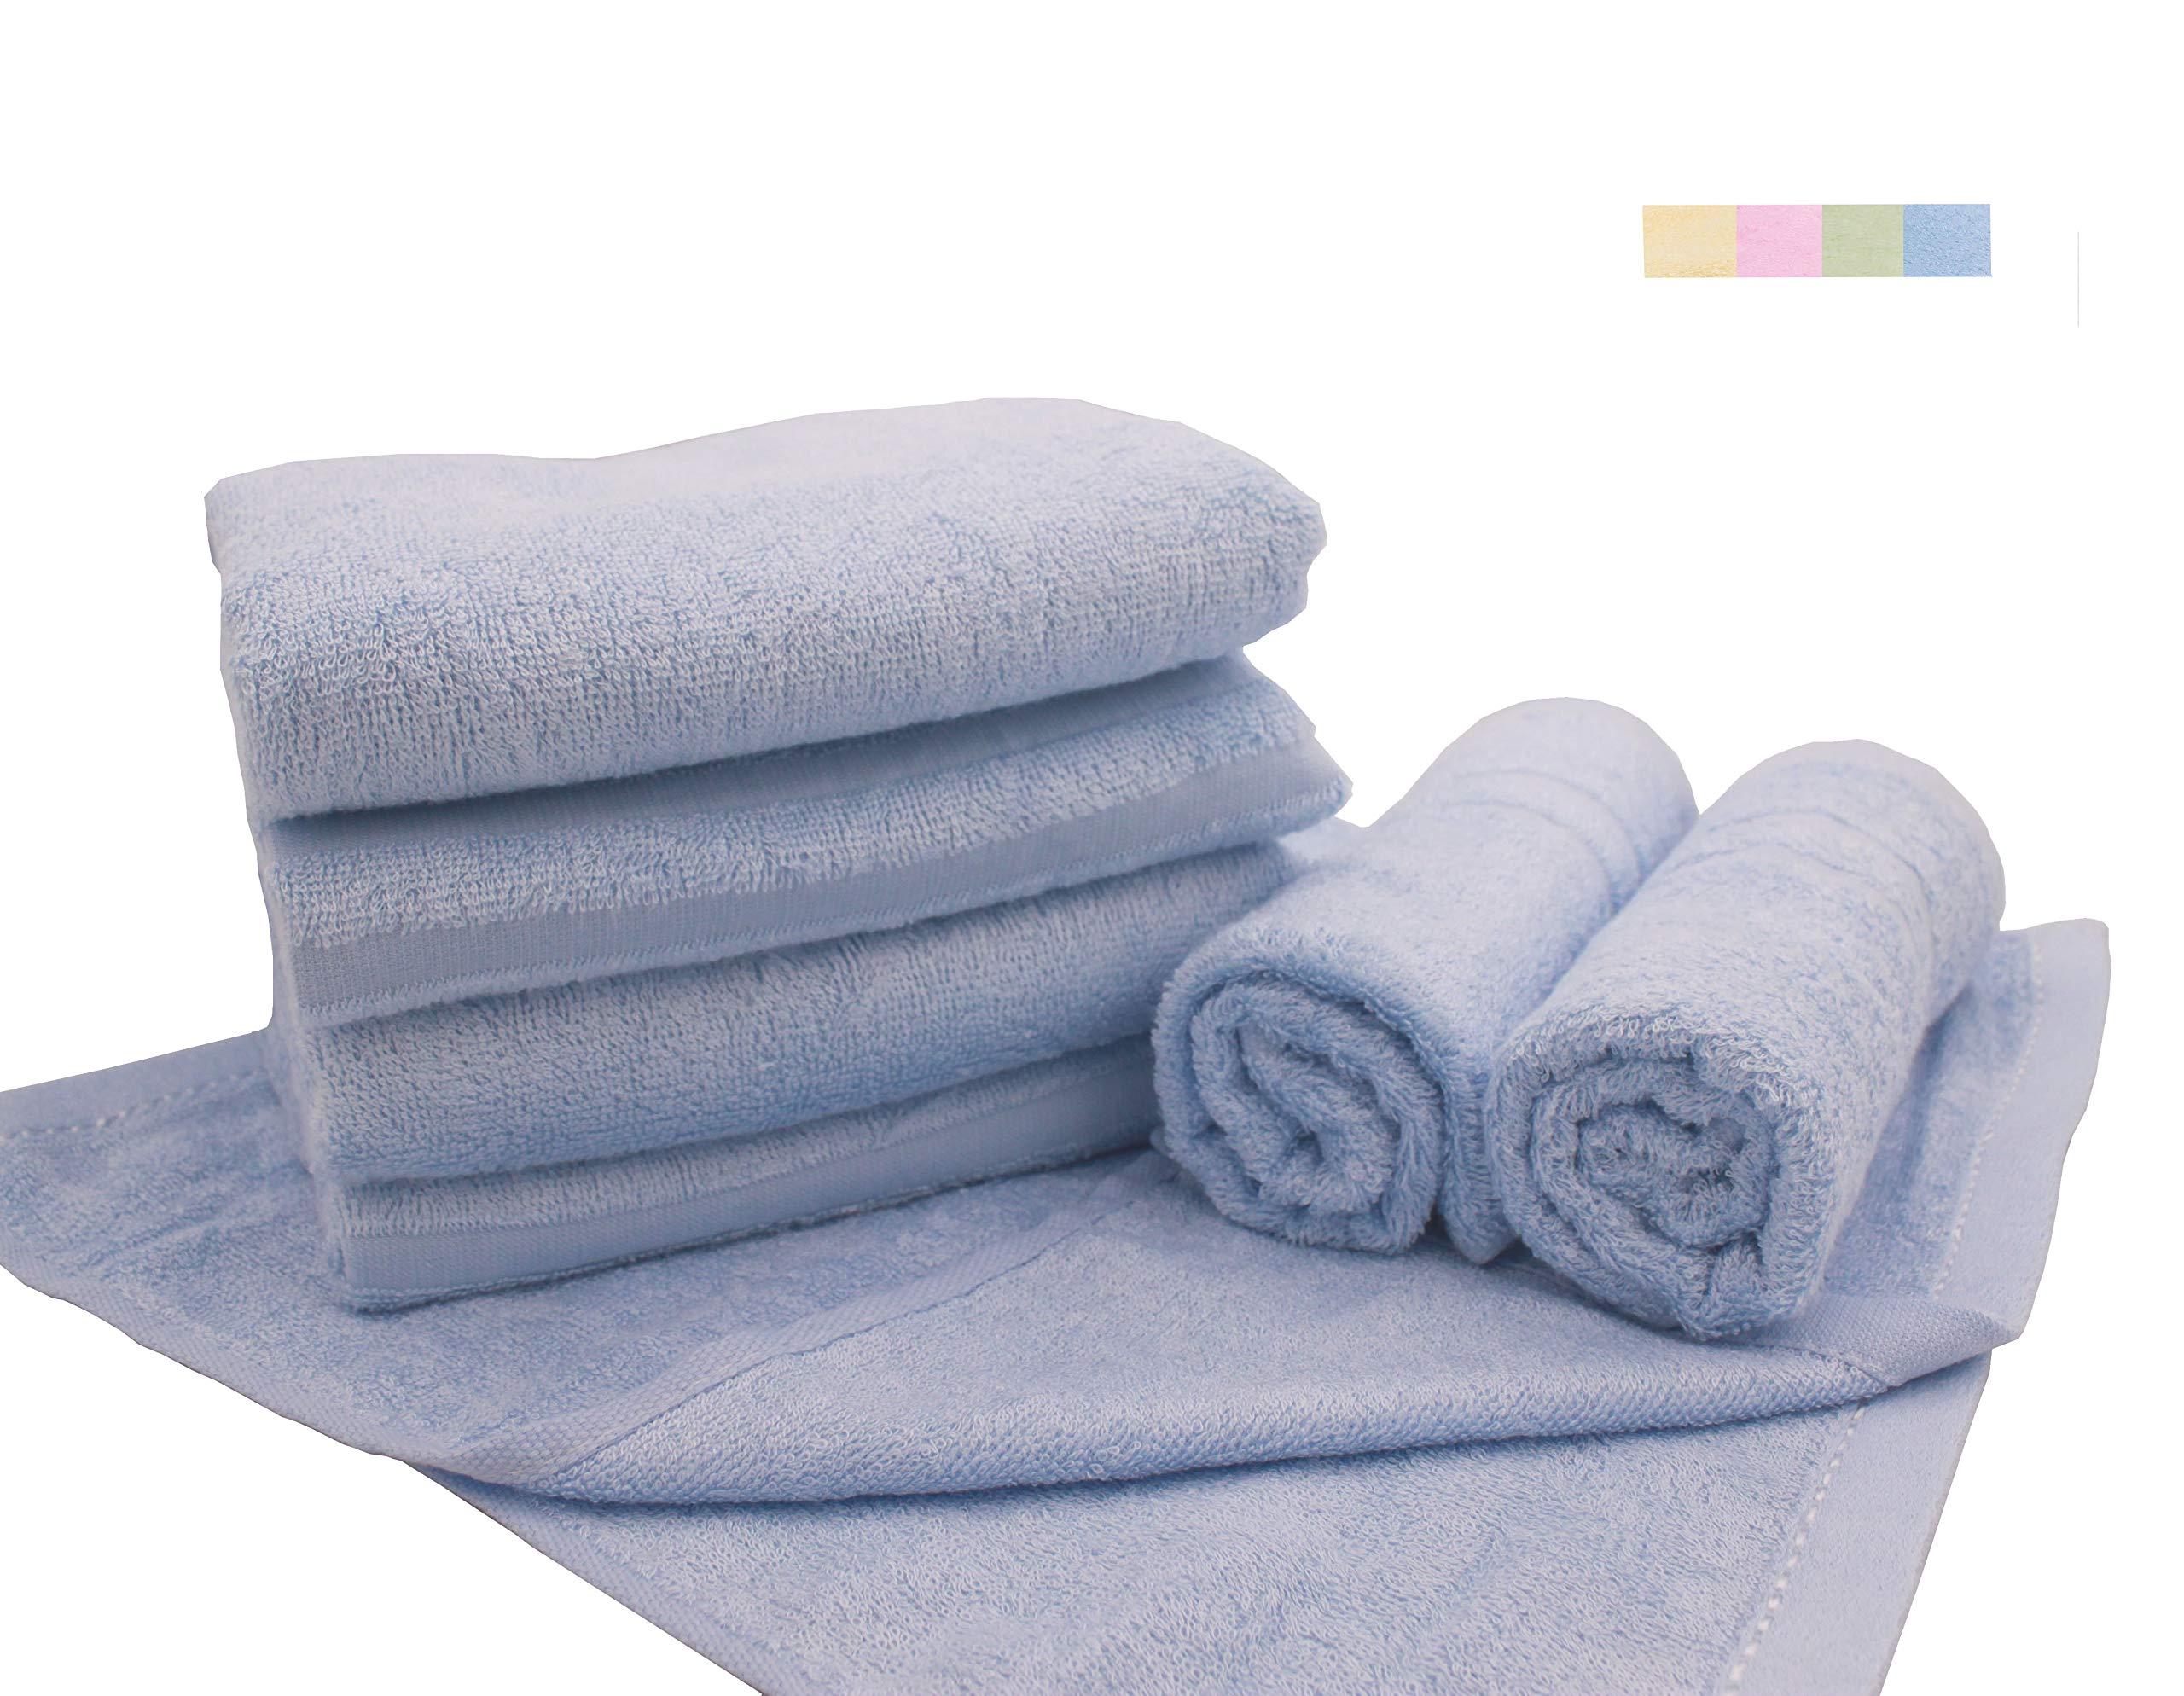 Home Bath Towel 100% Bamboo Fiber Fade-Resistant Super Soft and High Absorbent,2 Bath Towels,2 Hand Towels,2 Wash Clothes.Smoke Blue